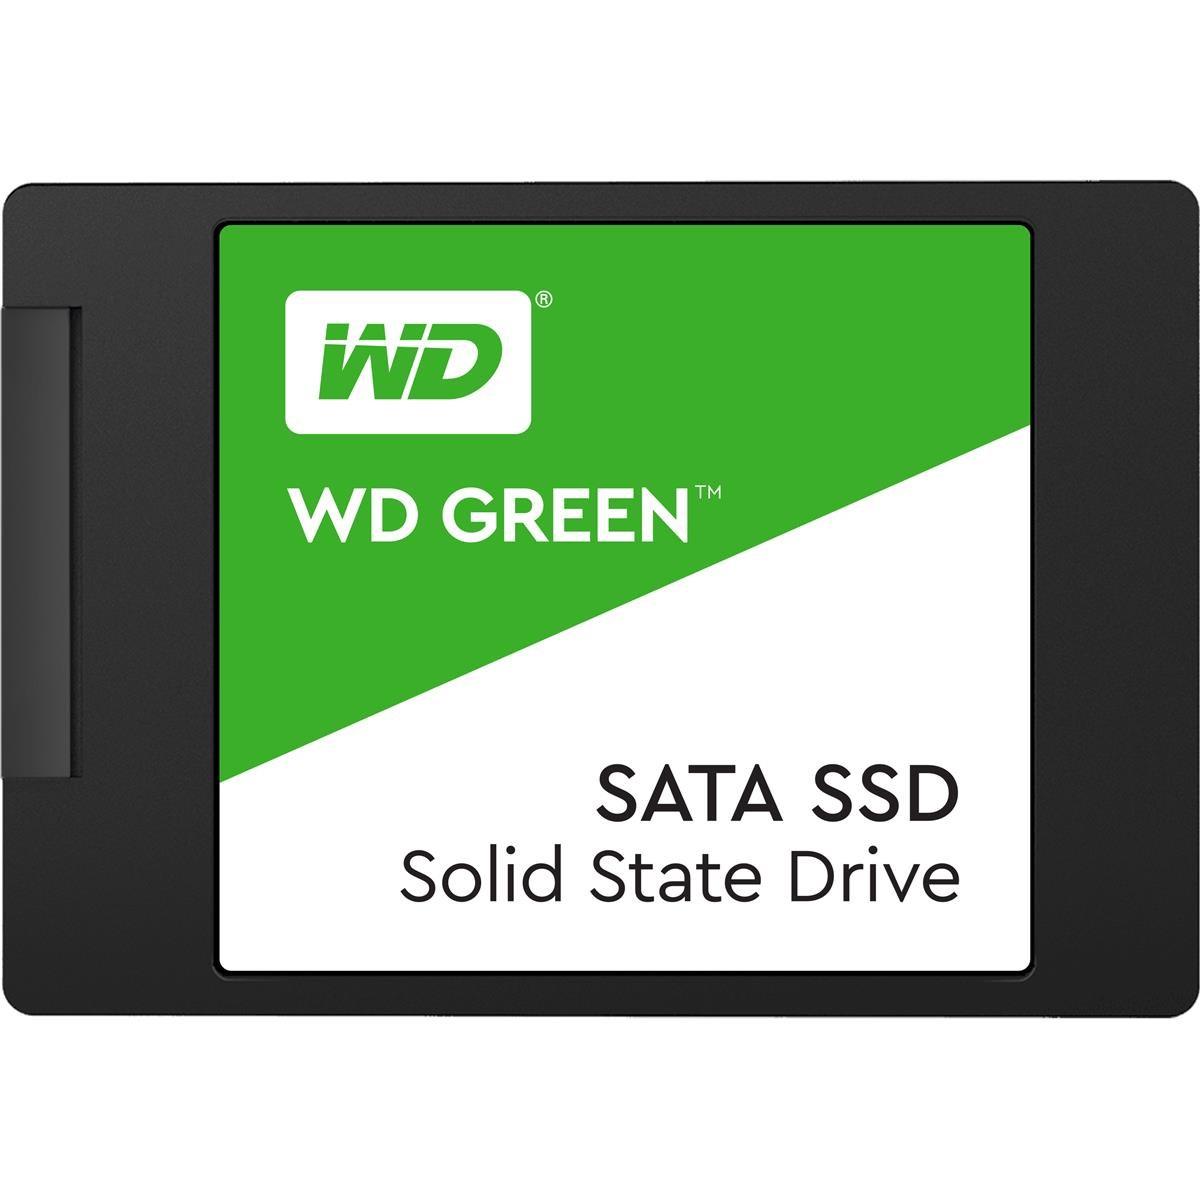 Western Digital Green 480 GB Internal SSD 2.5 Inch SATA, £49.99 delivered with code at Western Digital Shop